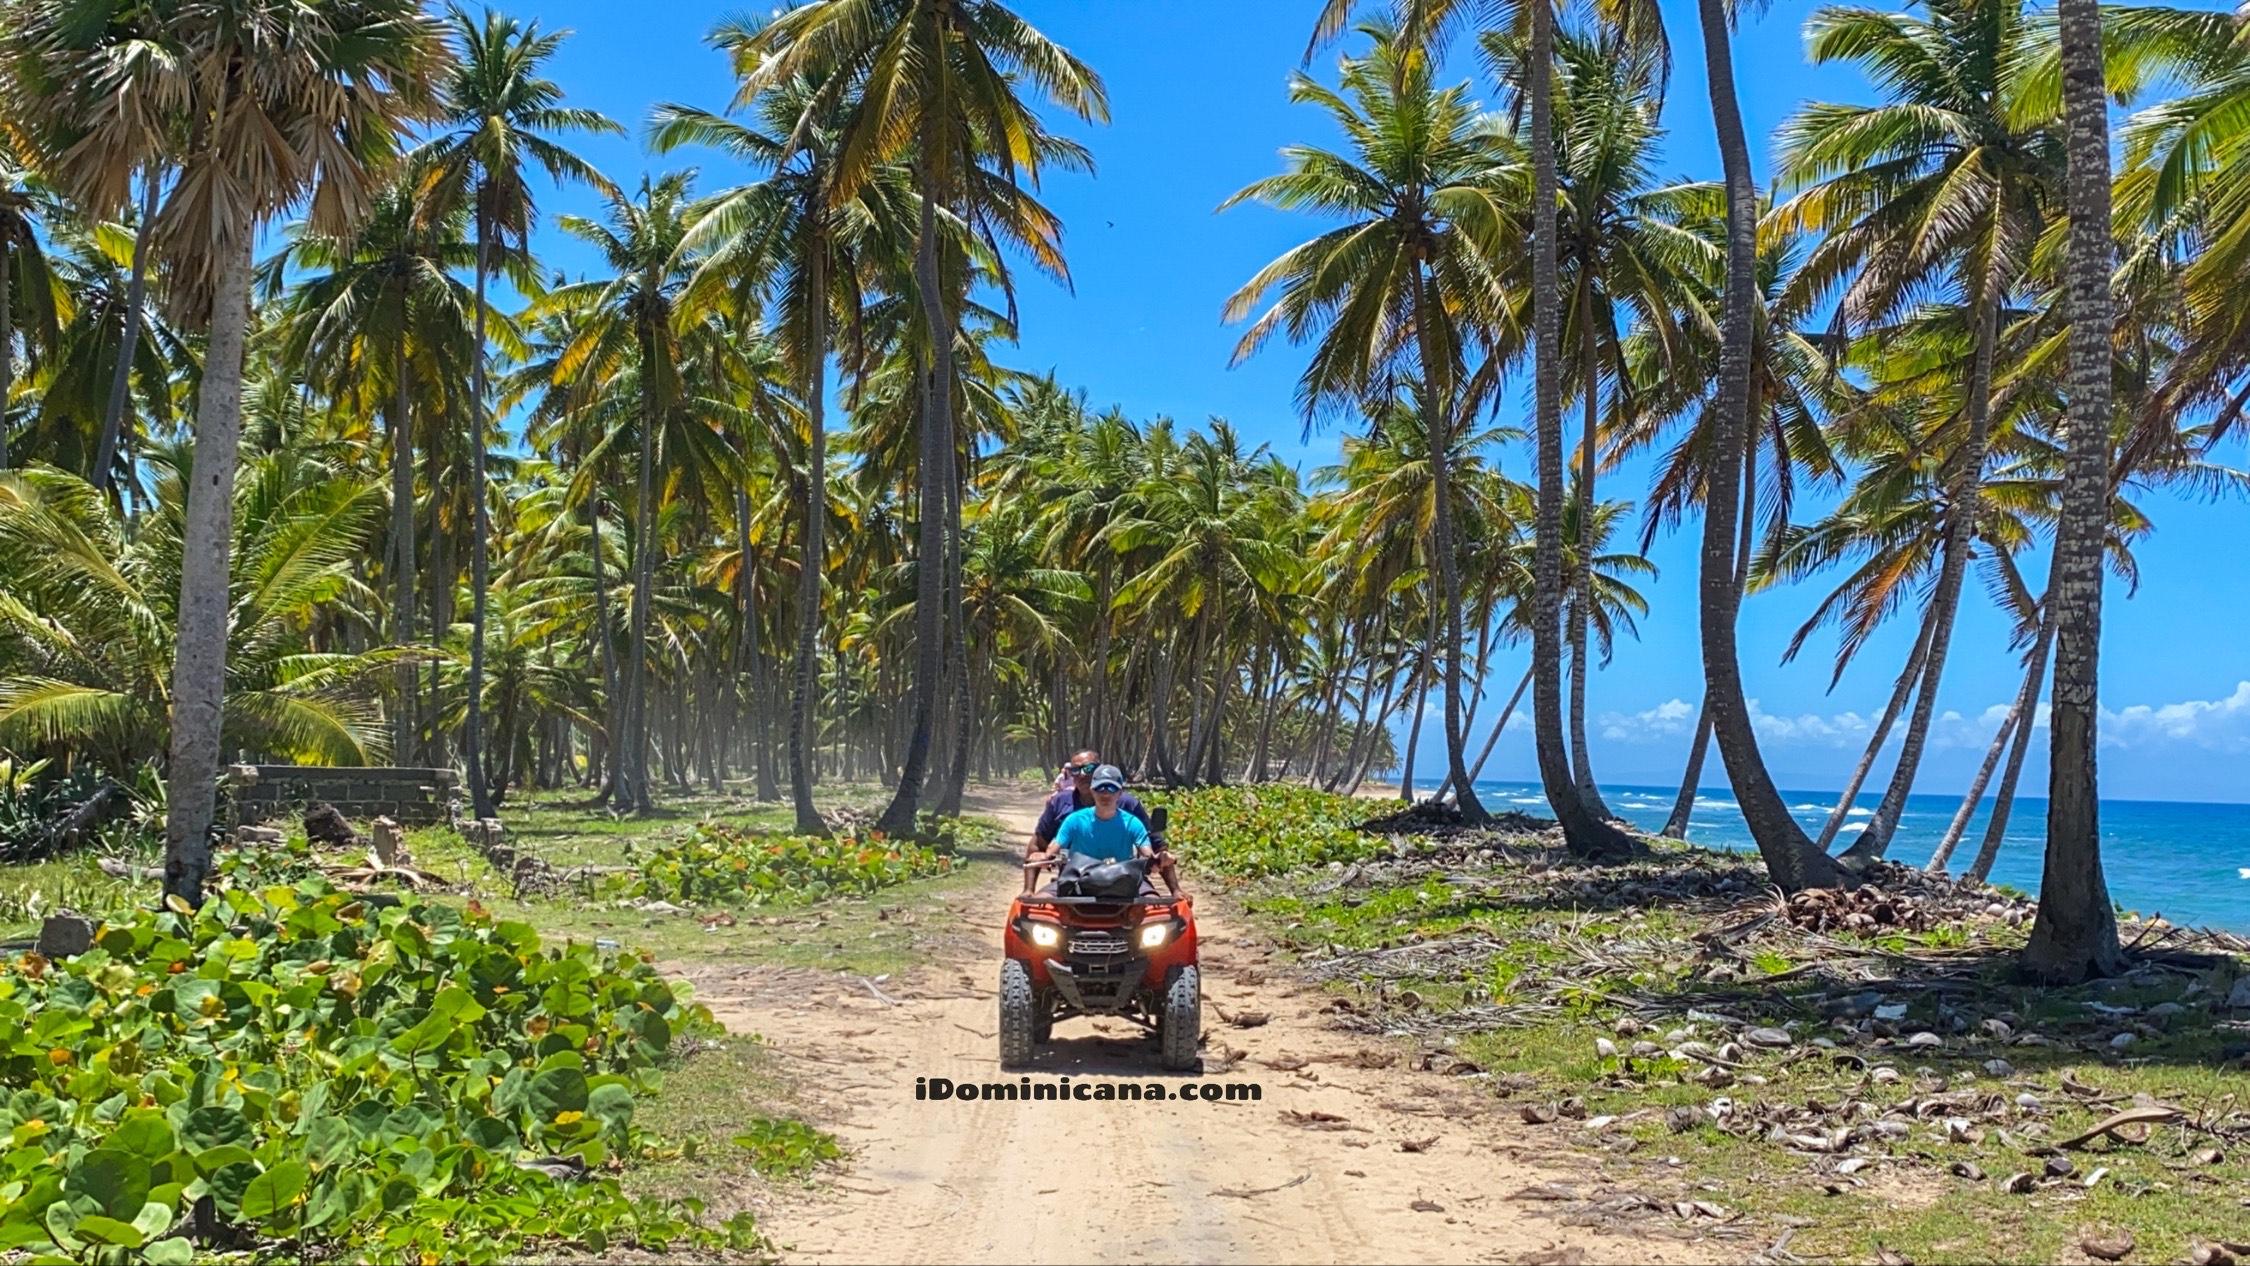 Сафари в Доминикане: дикие пляжи, глубинка, гора Редонда - новые фото, видео